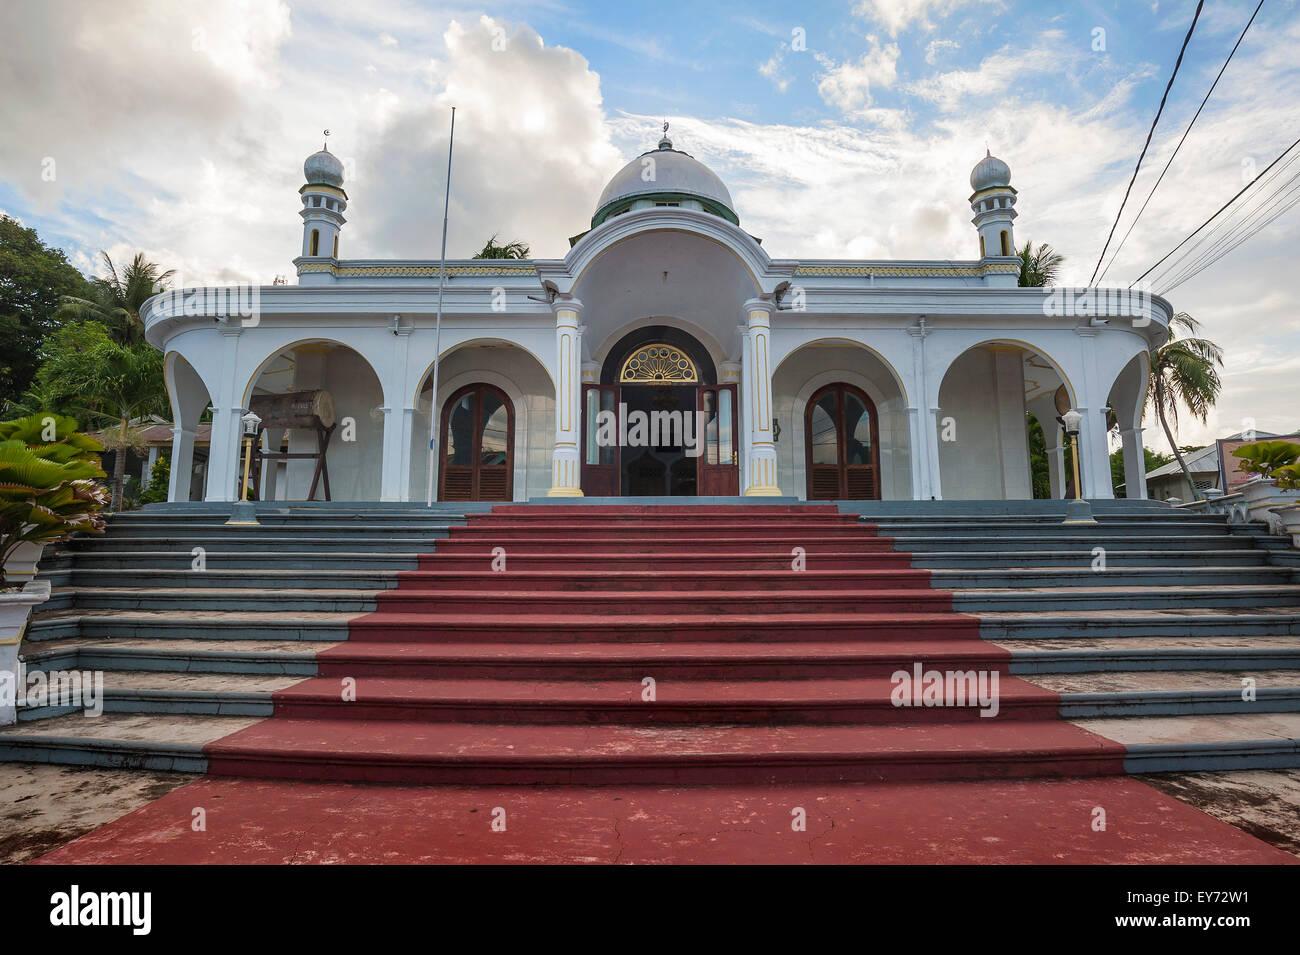 La moschea, Banda Neira, Banda isole, ISOLE MOLUCCHE, INDONESIA Immagini Stock